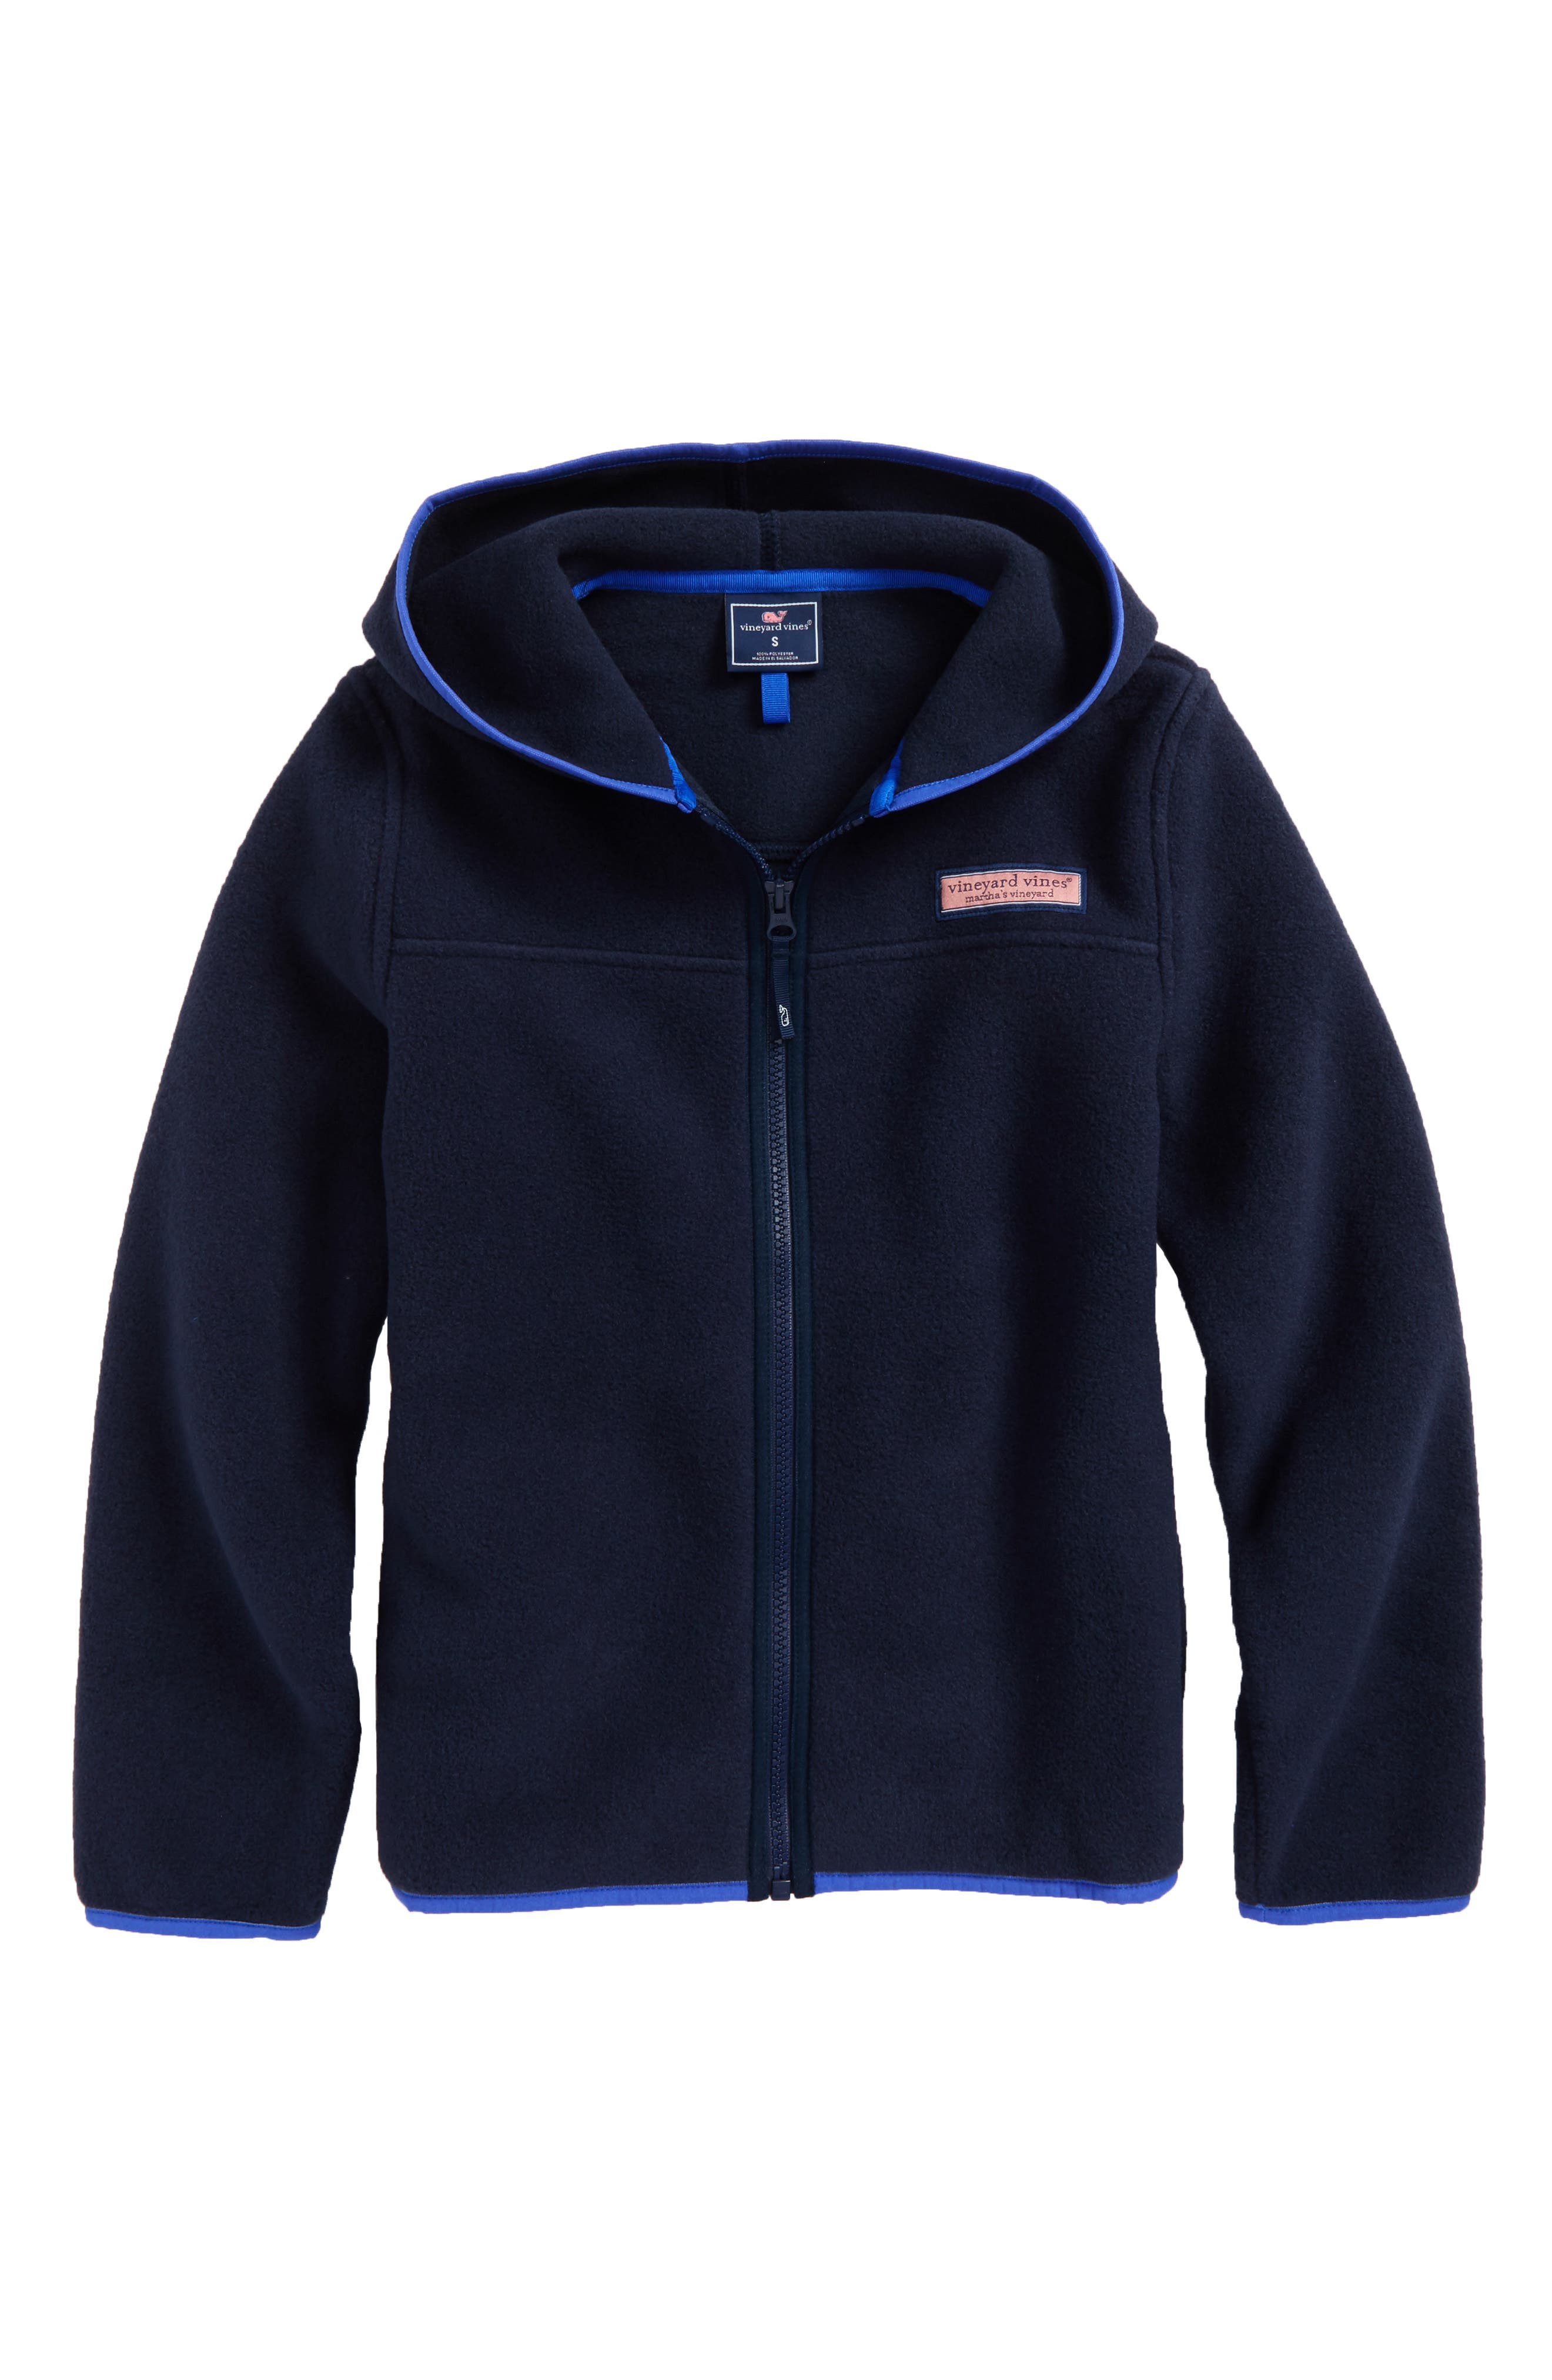 Hooded Full Zip Fleece Jacket,                             Main thumbnail 1, color,                             Vineyard Navy